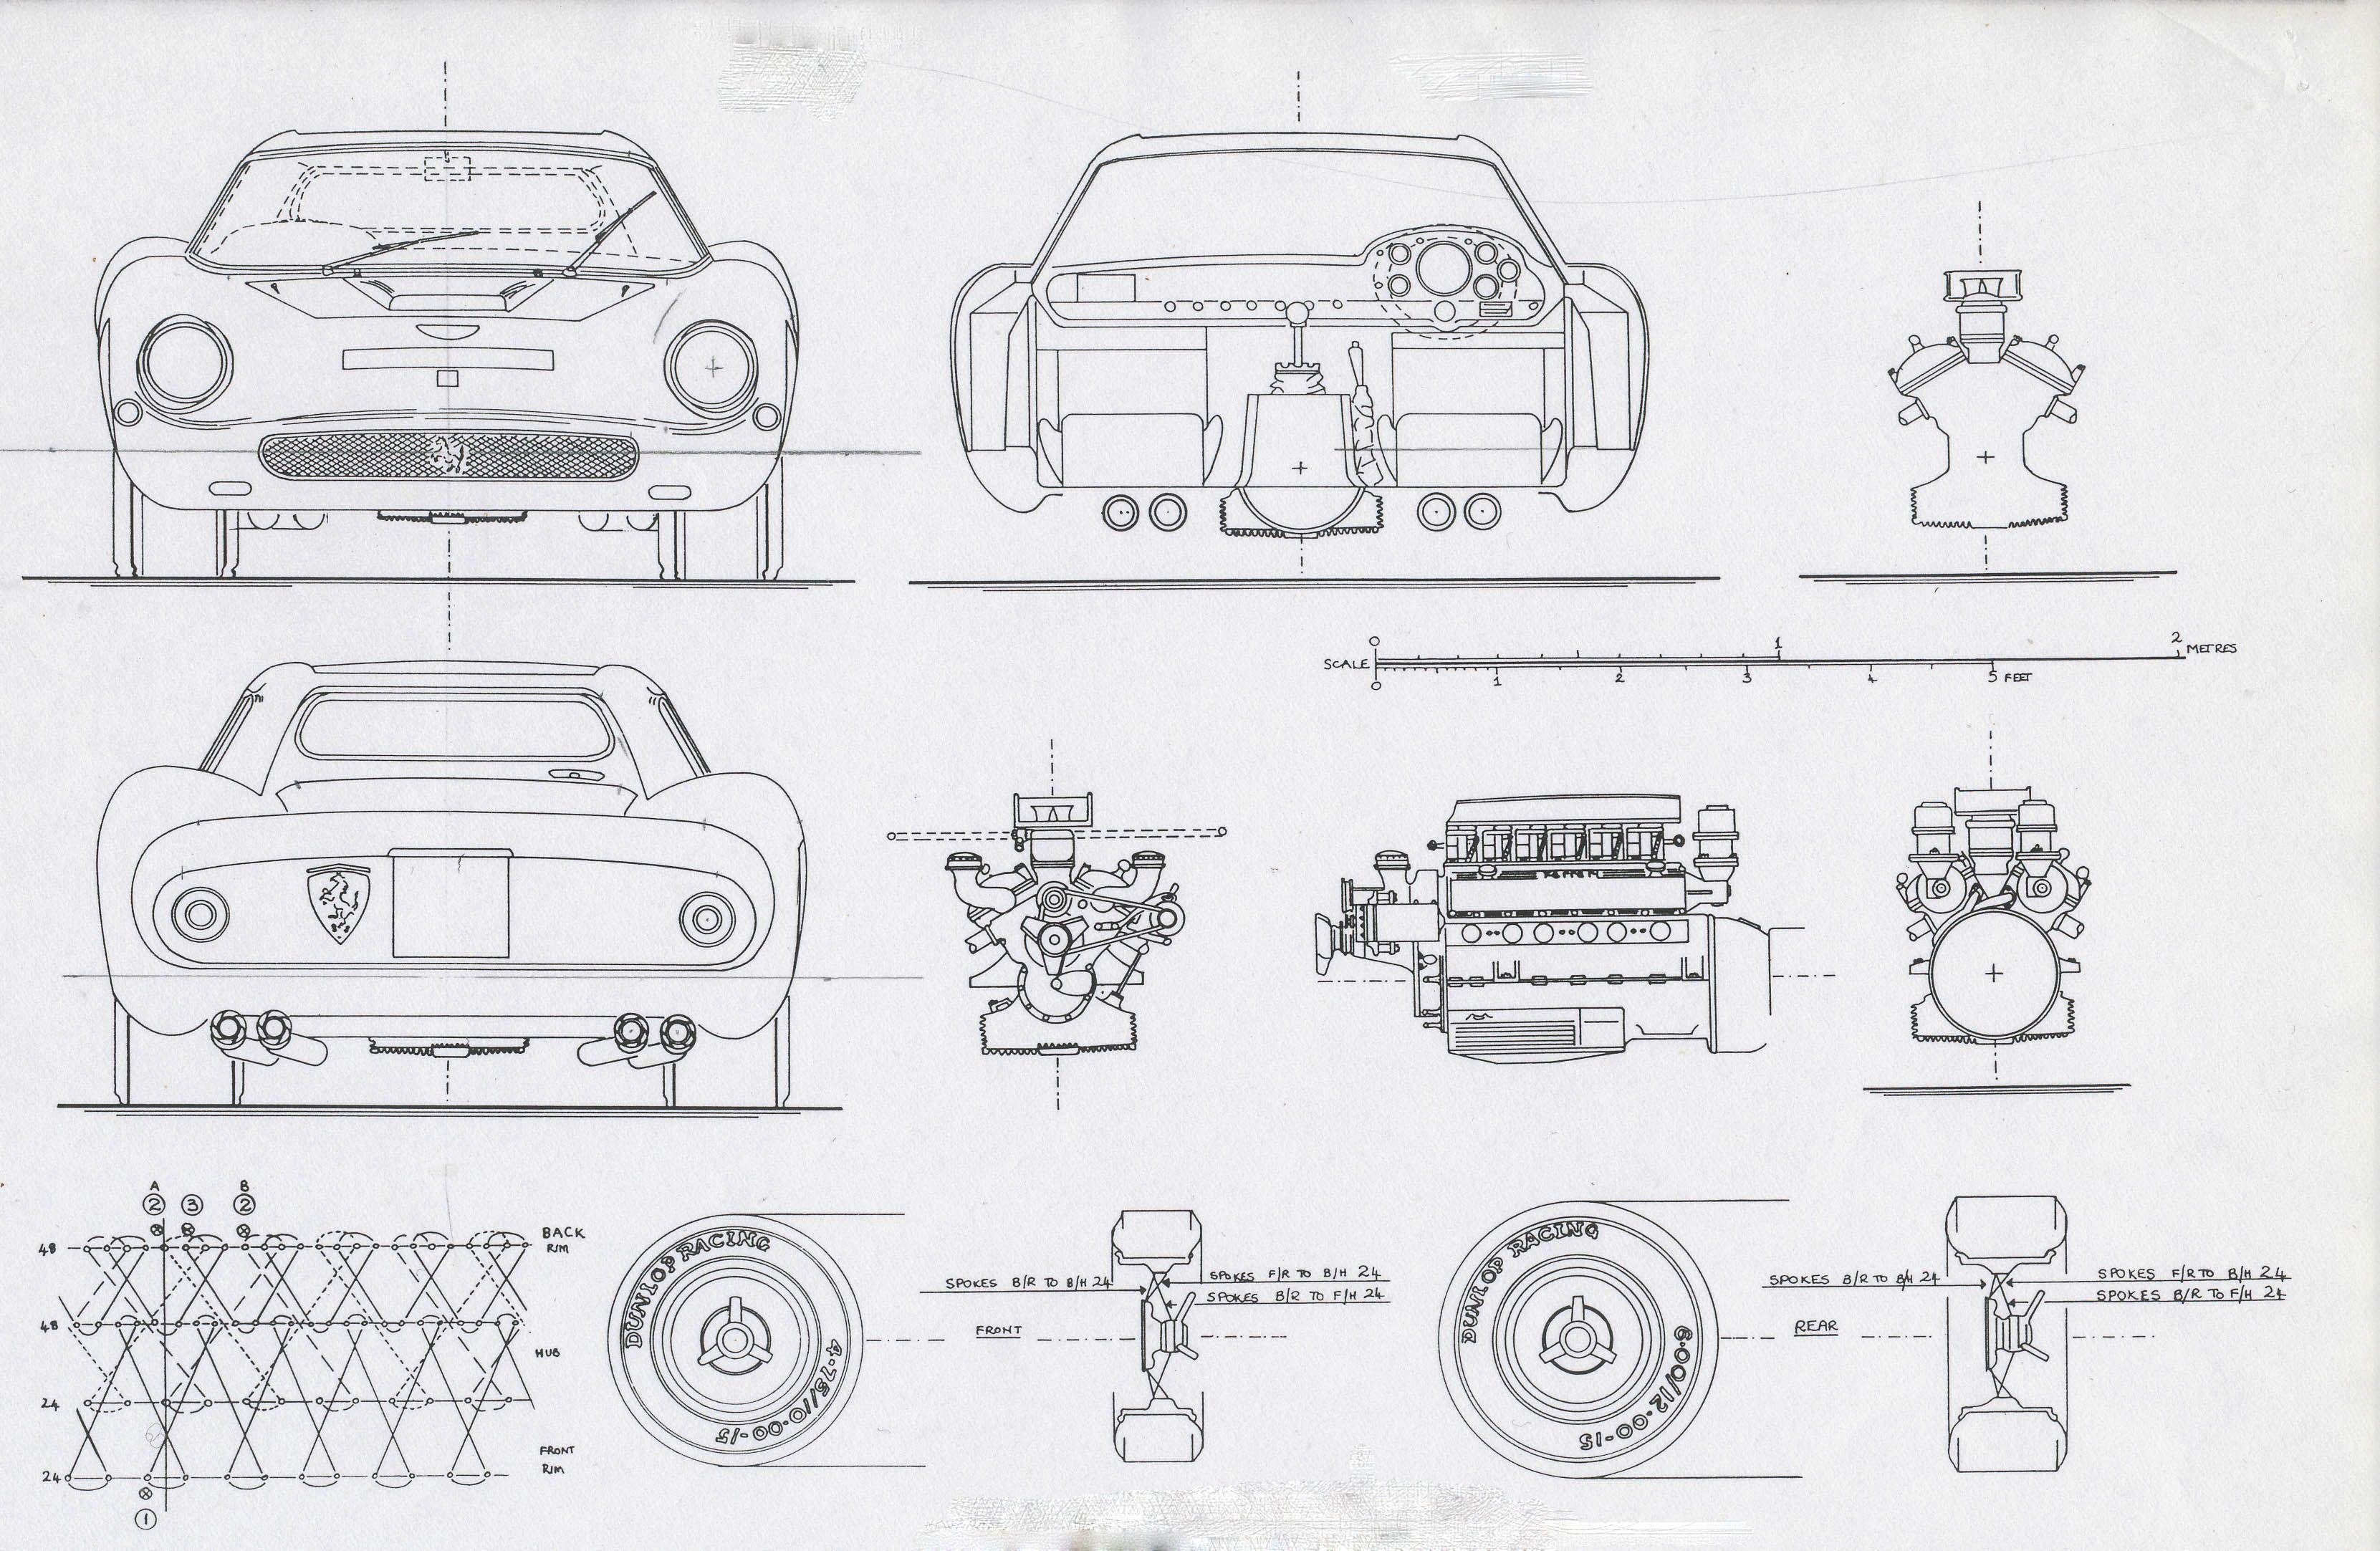 Ferrari 250 gto 1964 smcars car blueprints forum cars net car blueprints forum malvernweather Choice Image